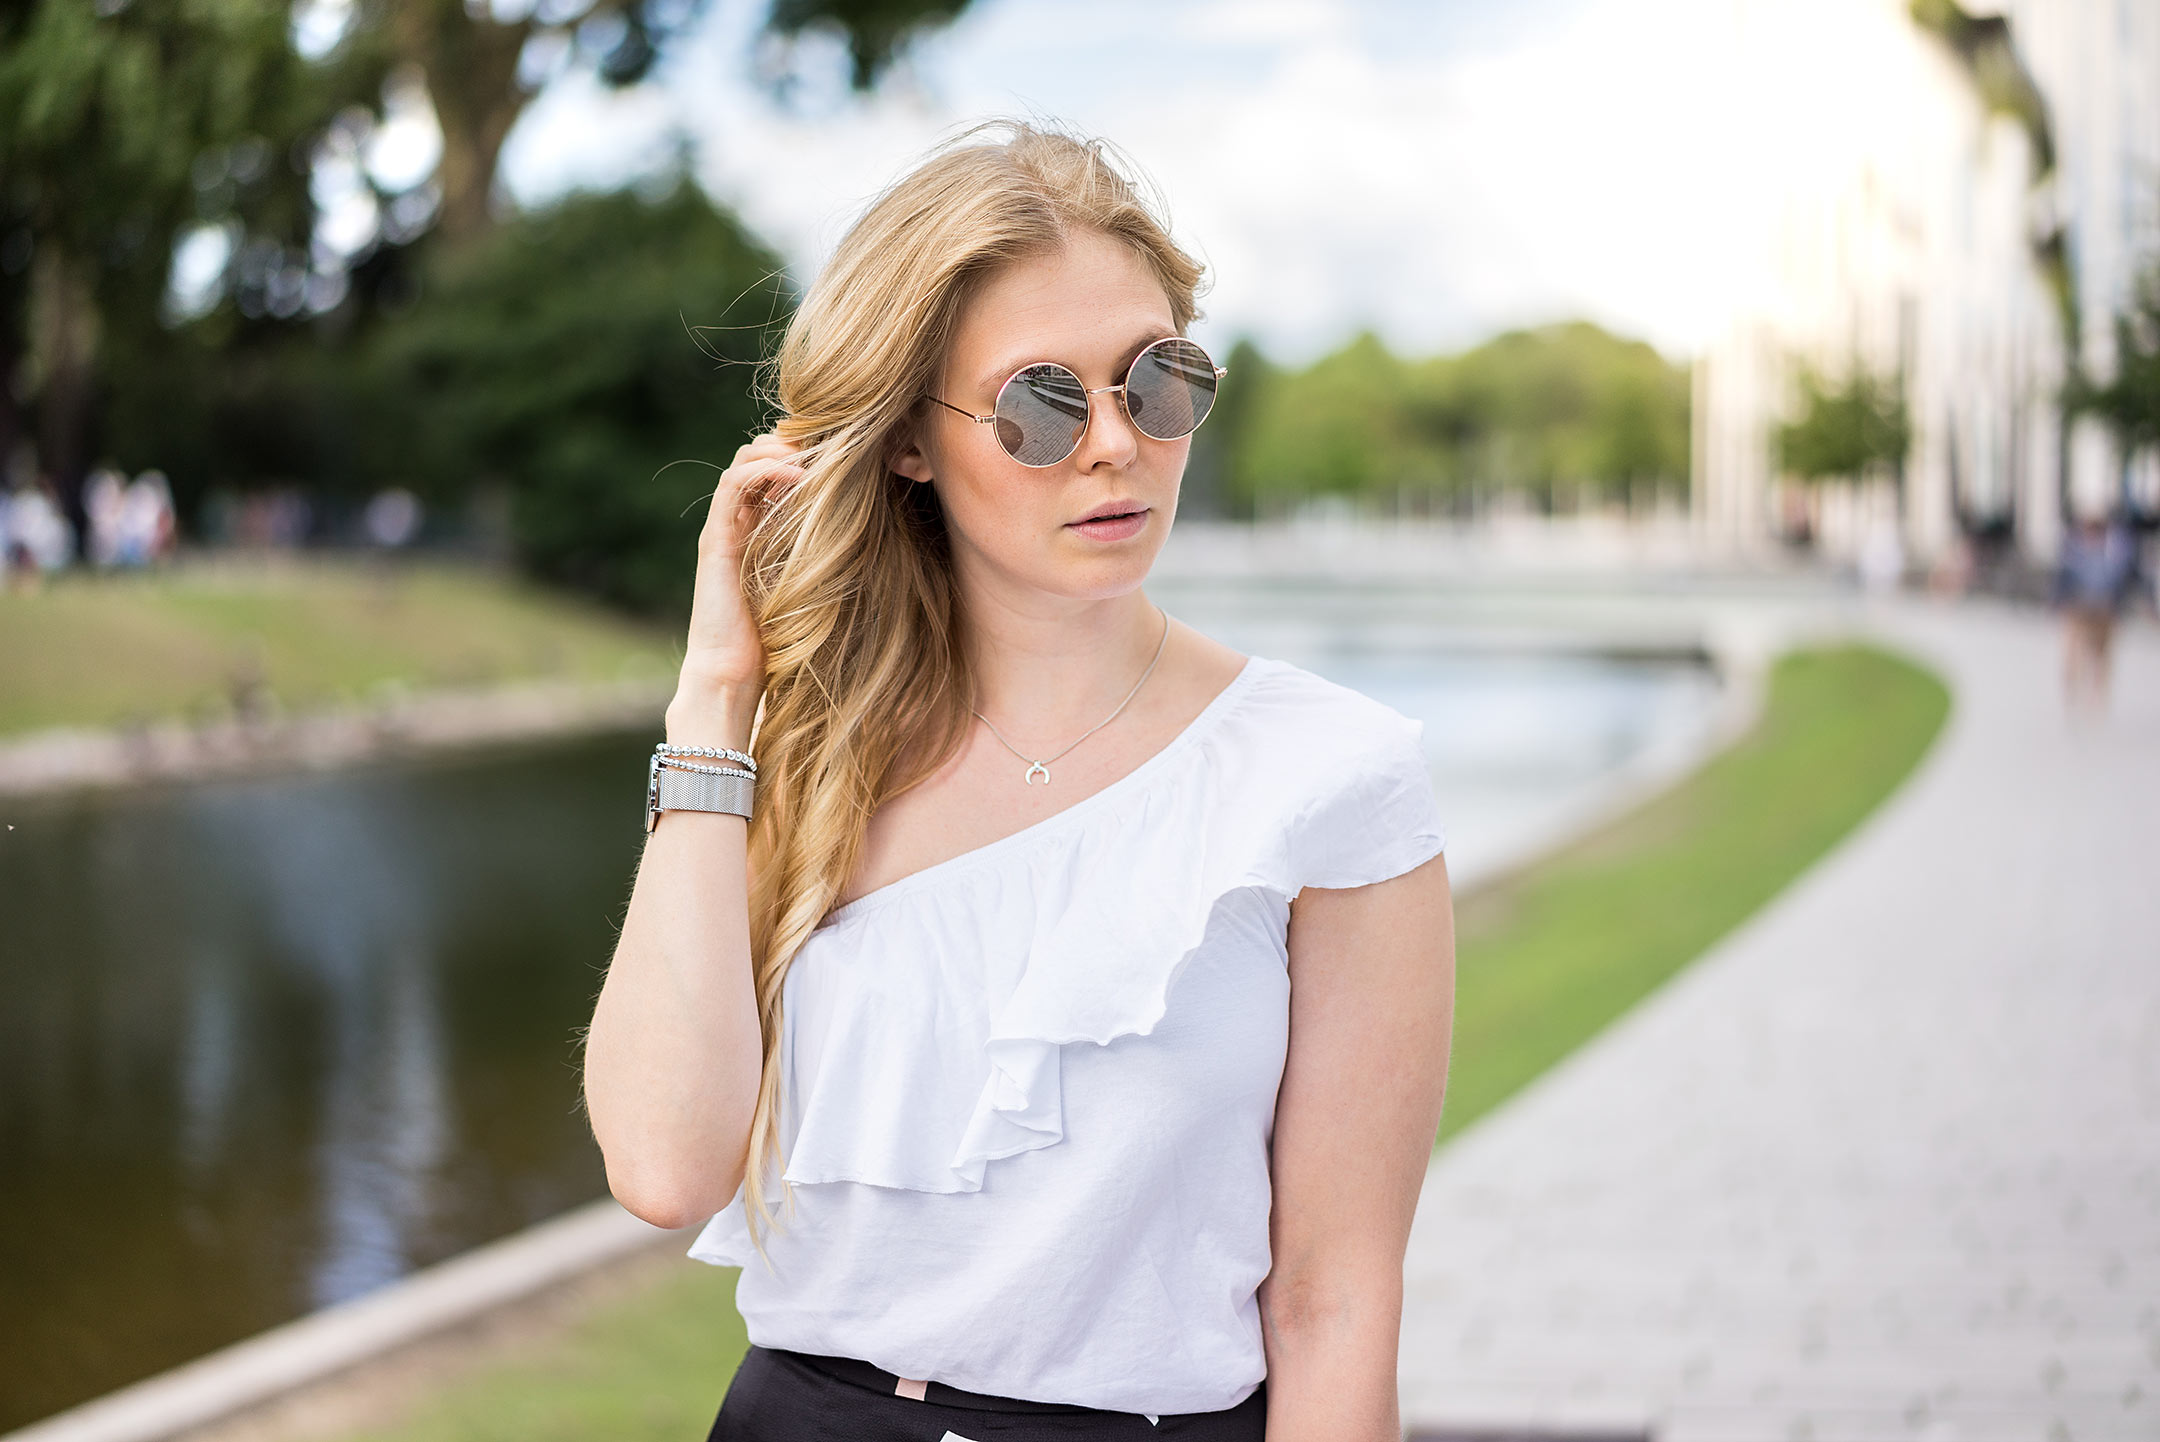 Sunnyinga Sonnenbrille One-Shoulder Top Weiß Modeblog Düsseldorf